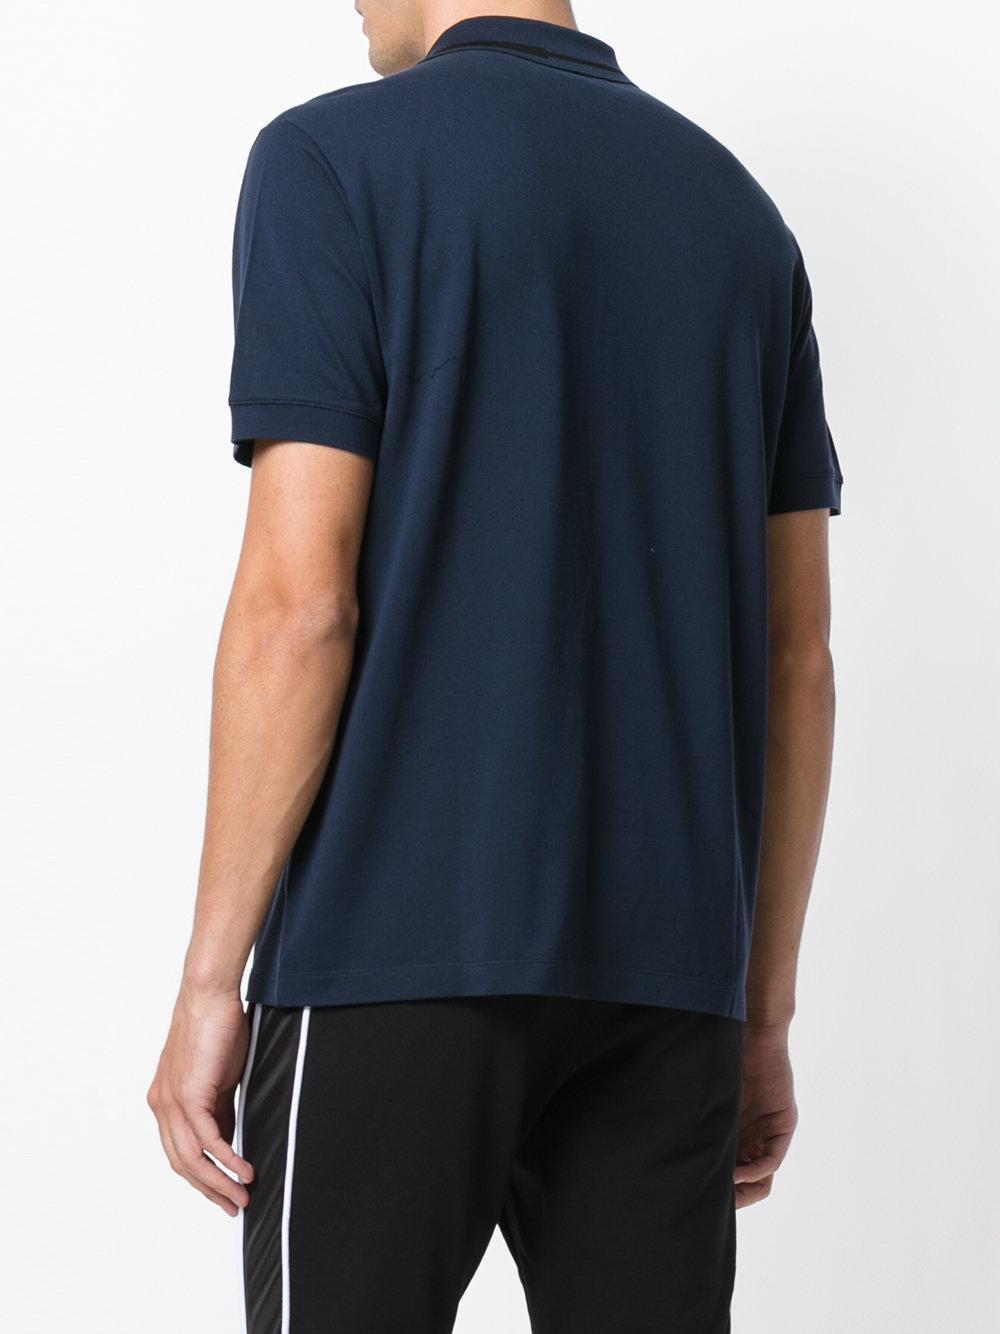 Versace Cotton Medusa Badge Crew Neck Short Sleeve T-shirt in Blue for Men